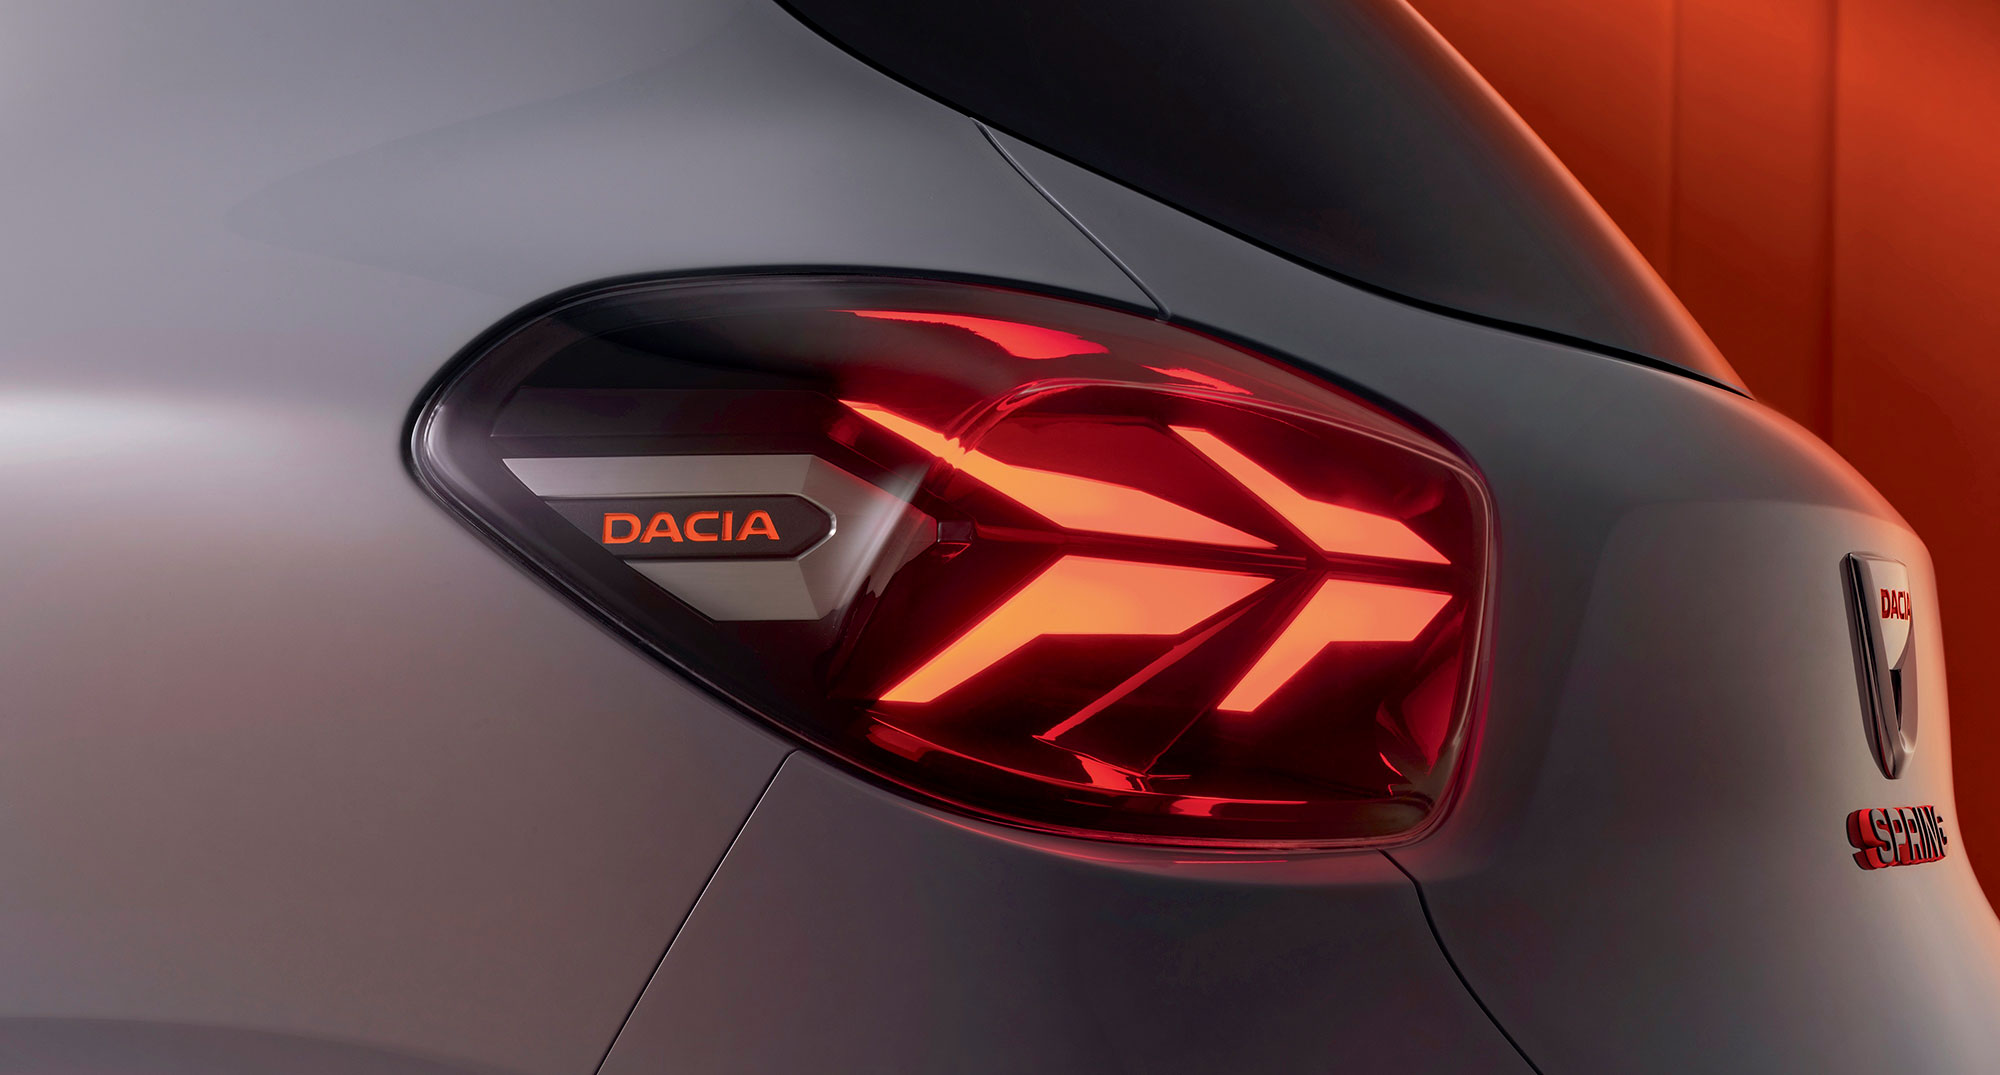 dacia_spring_show_car-elektrik.jpg